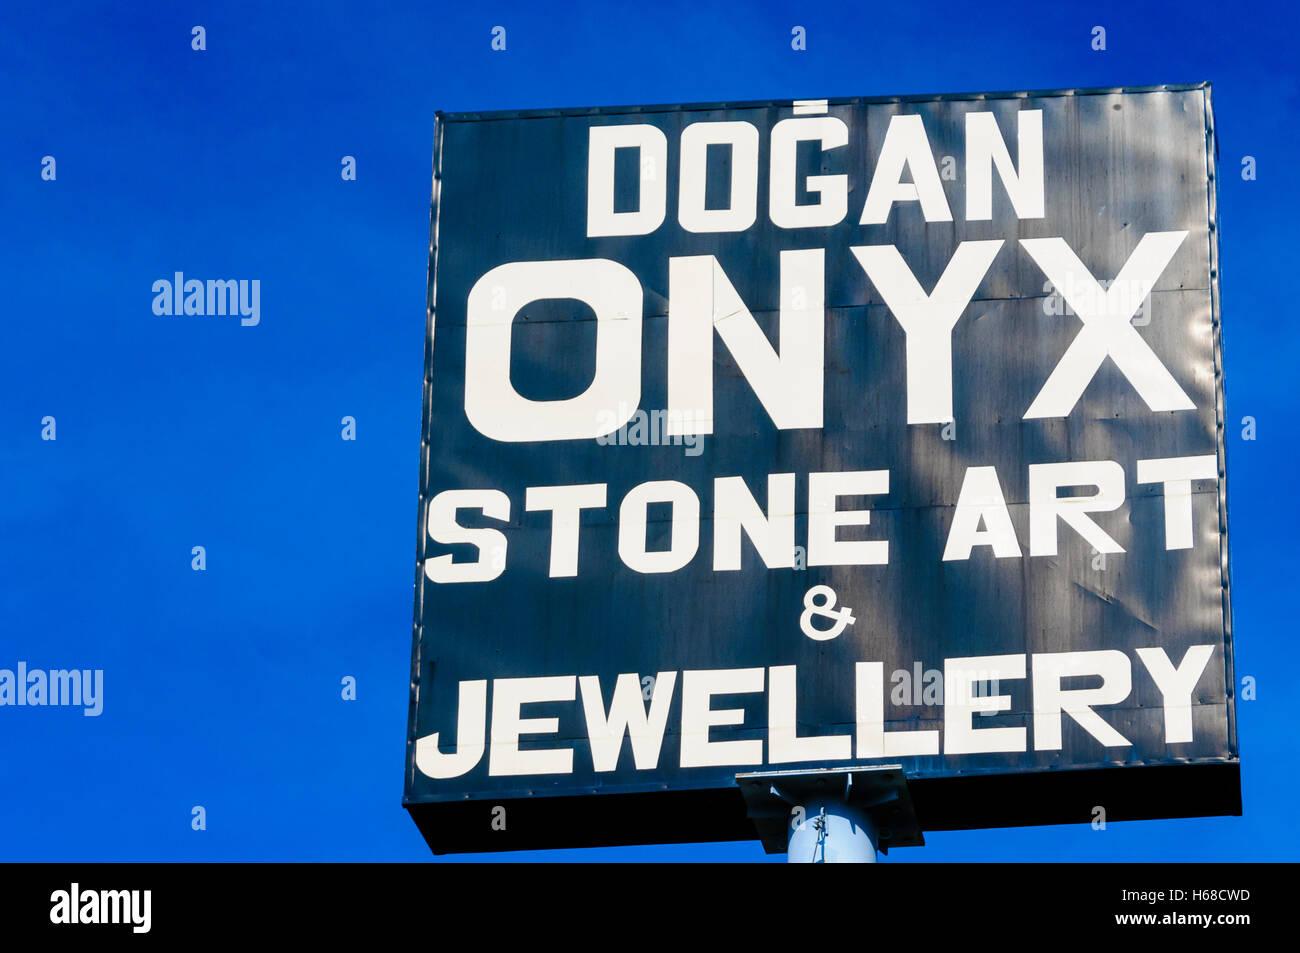 Onyx Stone Stock Photos & Onyx Stone Stock Images - Alamy